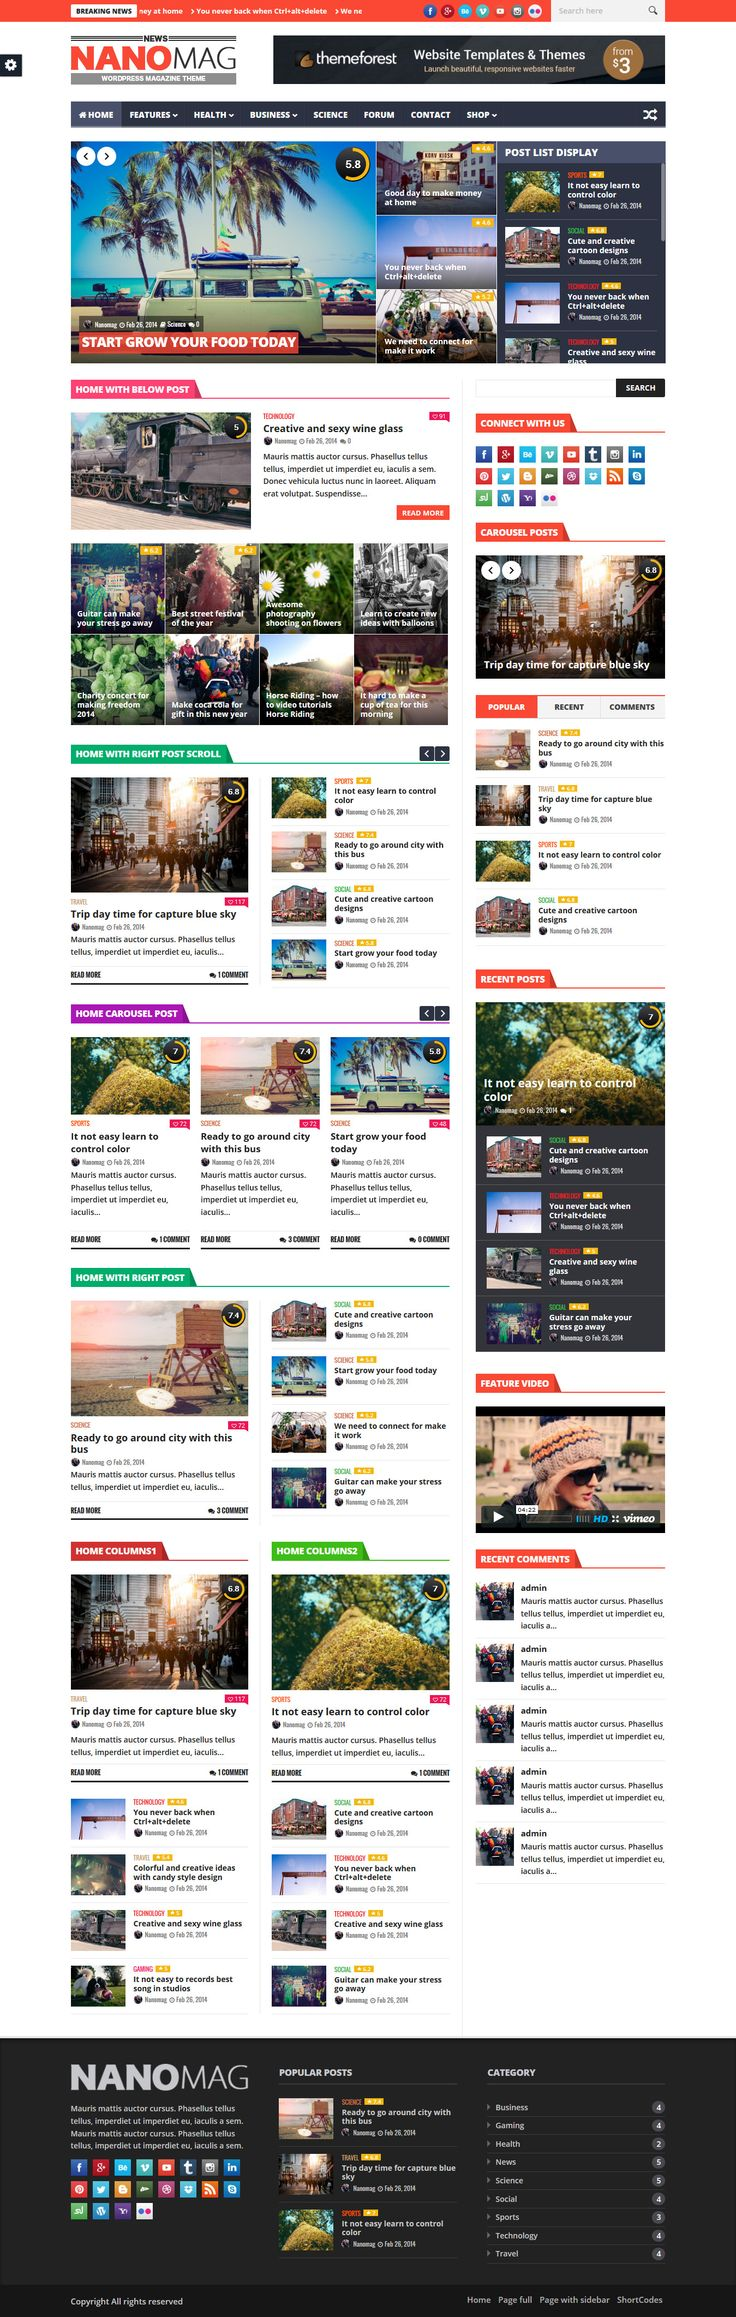 NanoMag – Responsive WordPress Magazine Theme. Download: http://themeforest.net/item/nanomag-responsive-wordpress-magazine-theme/10036095?ref=ksioks